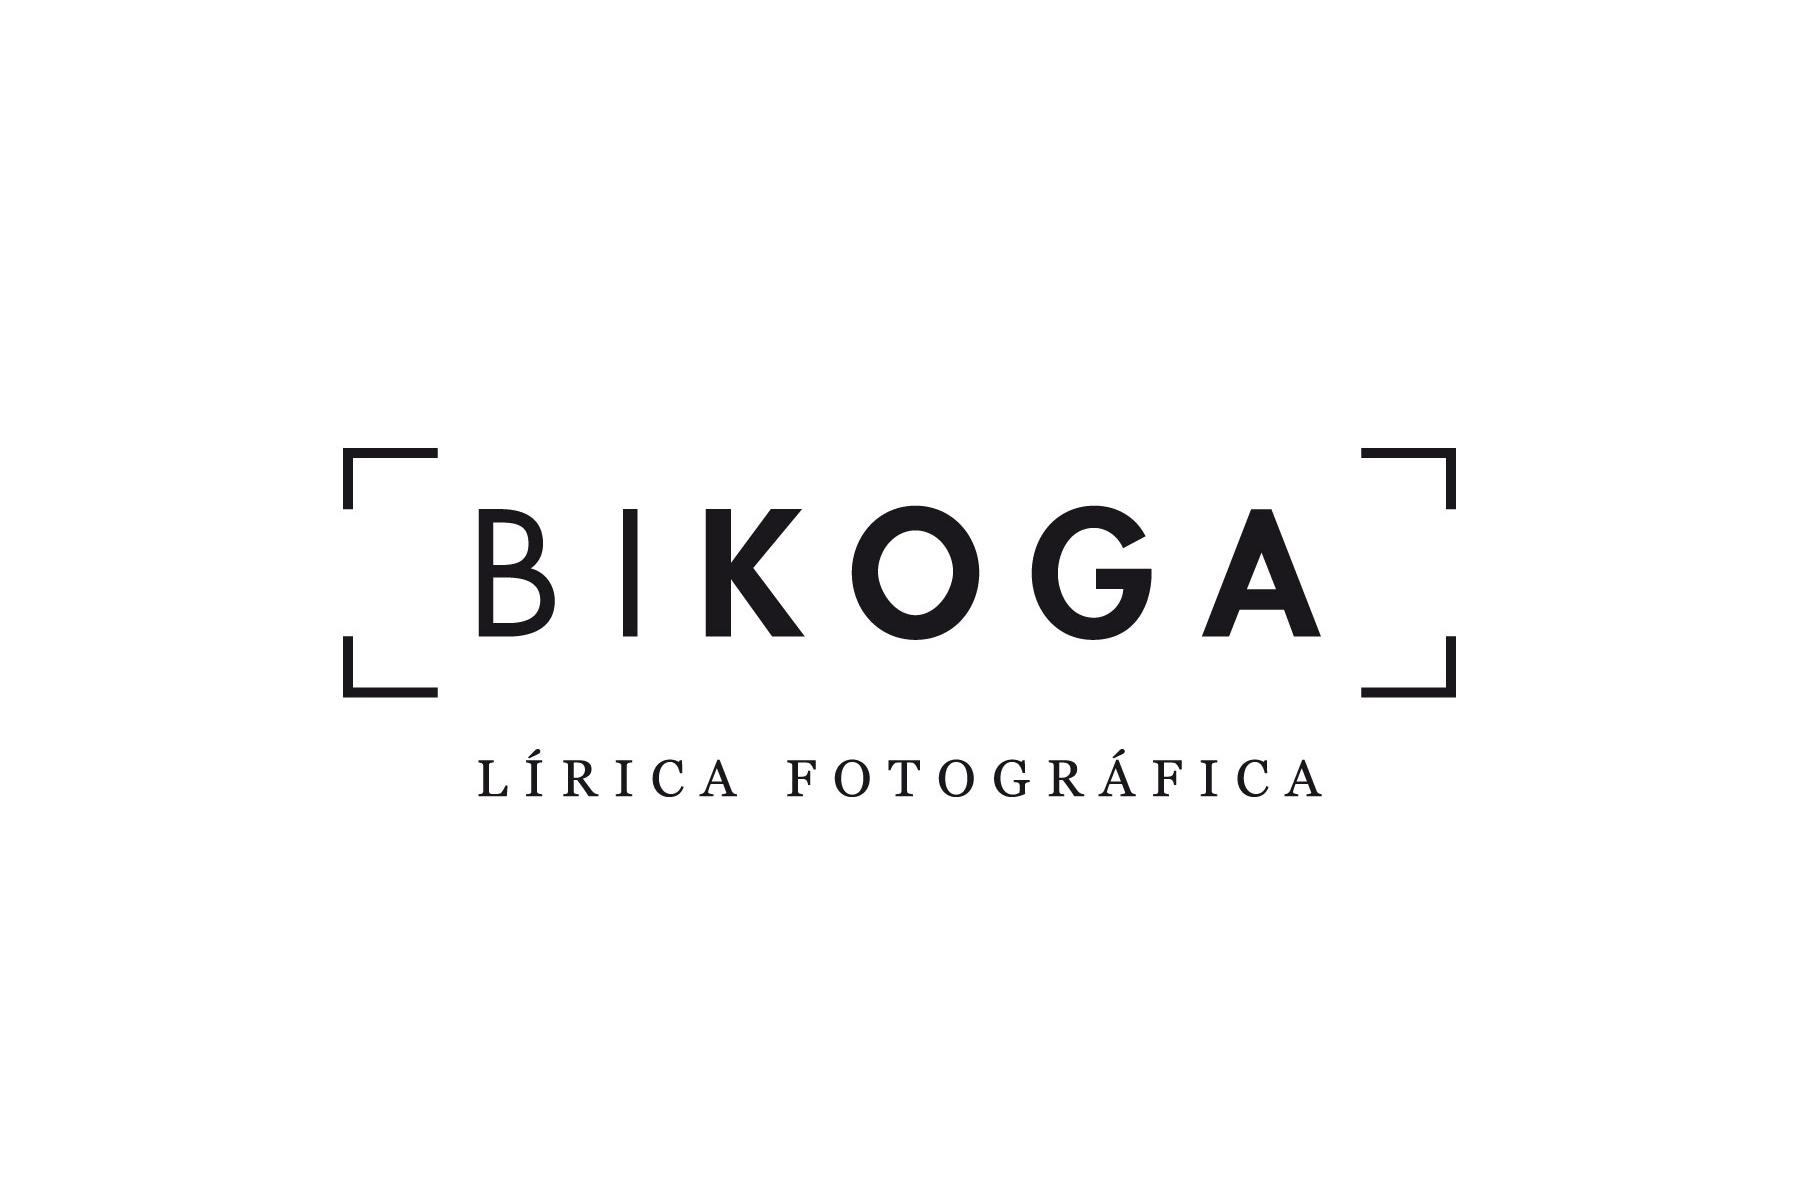 BIKOGA Lírica fotográfica